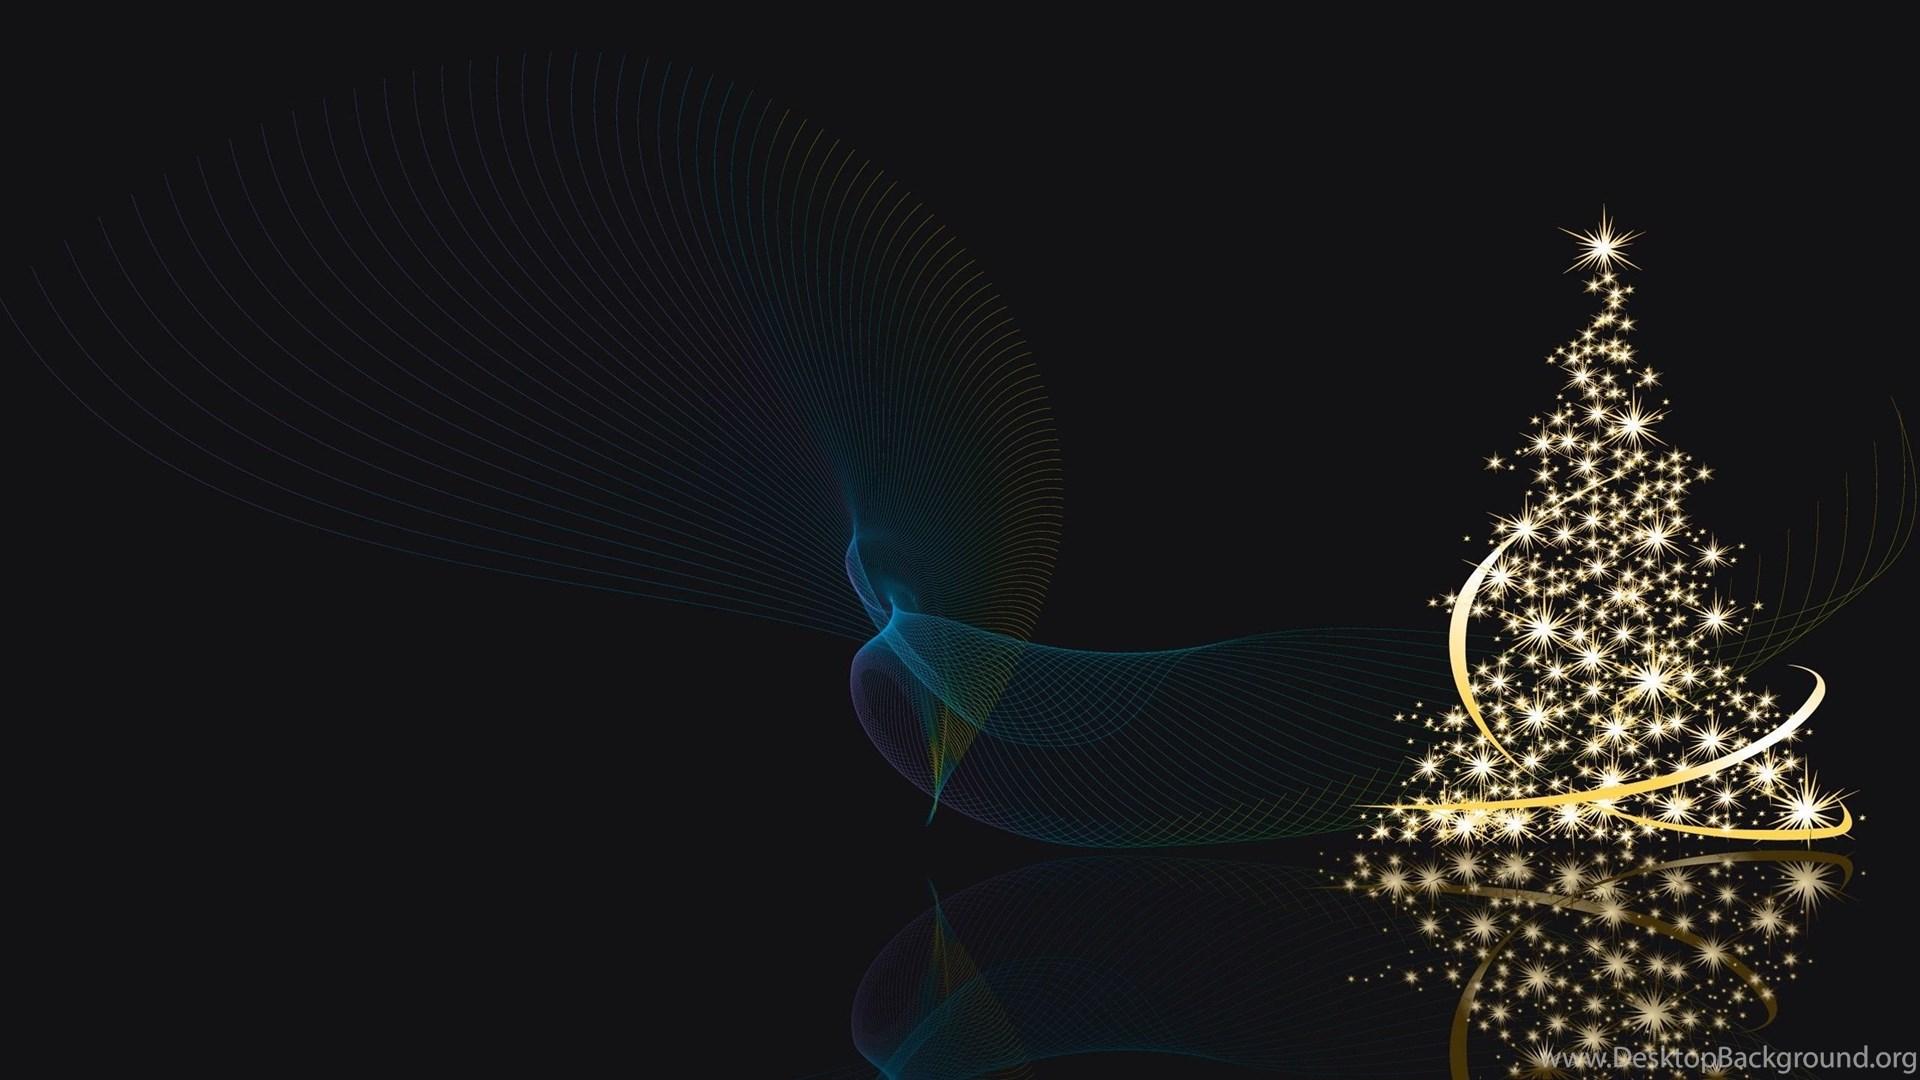 Download Wallpapers 2560x1440 Christmas Tree, Lights, Shine Mac ...